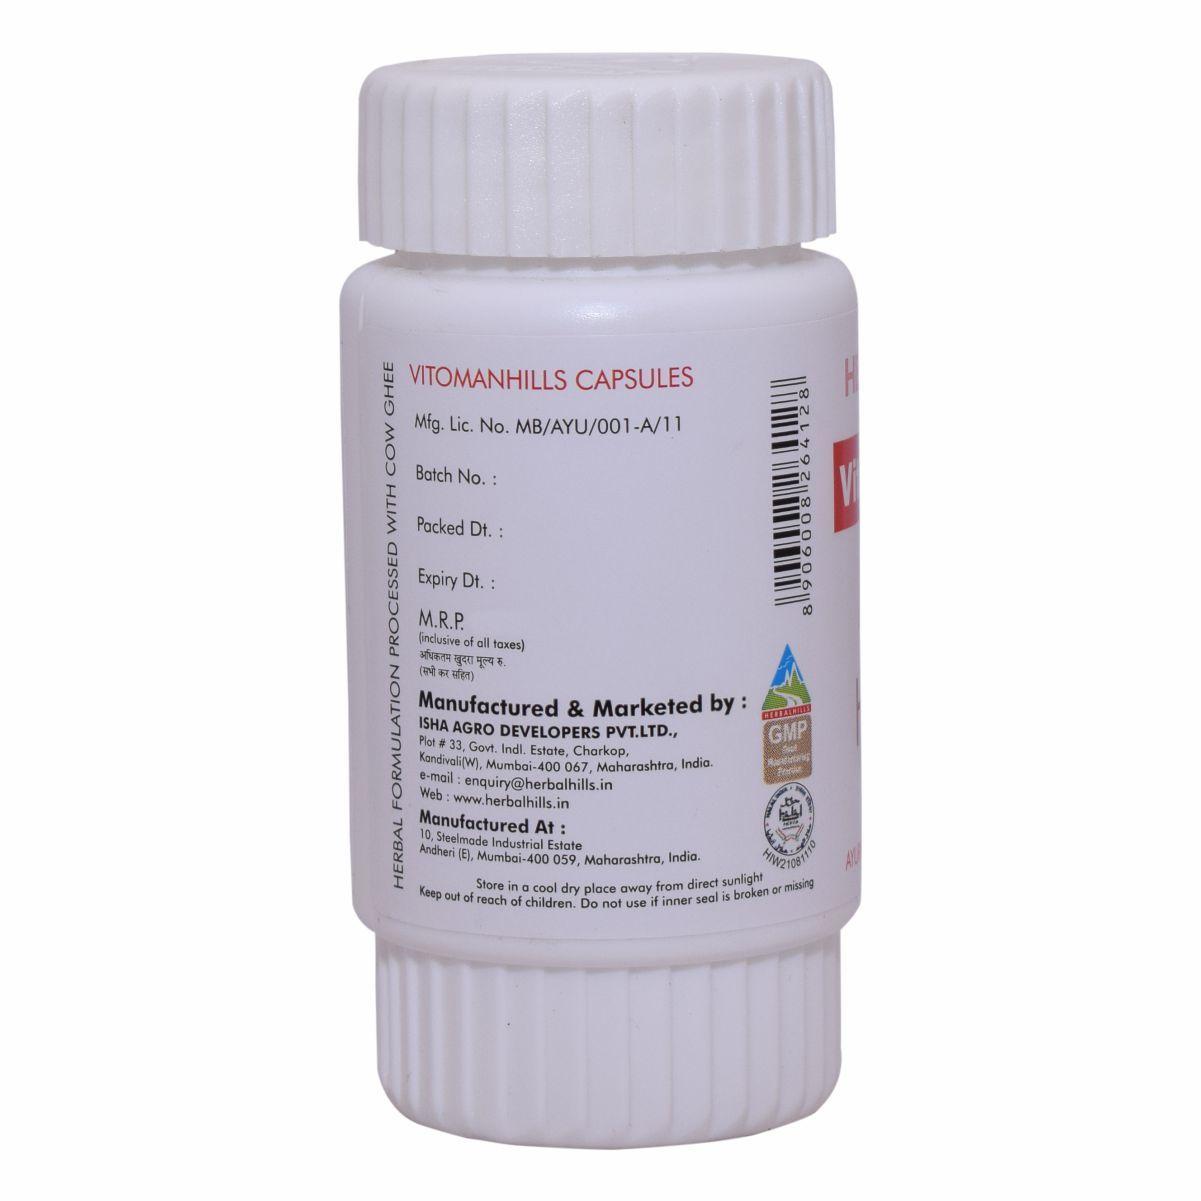 ayurvedic medicines for strength and stamina - Vitomanhills